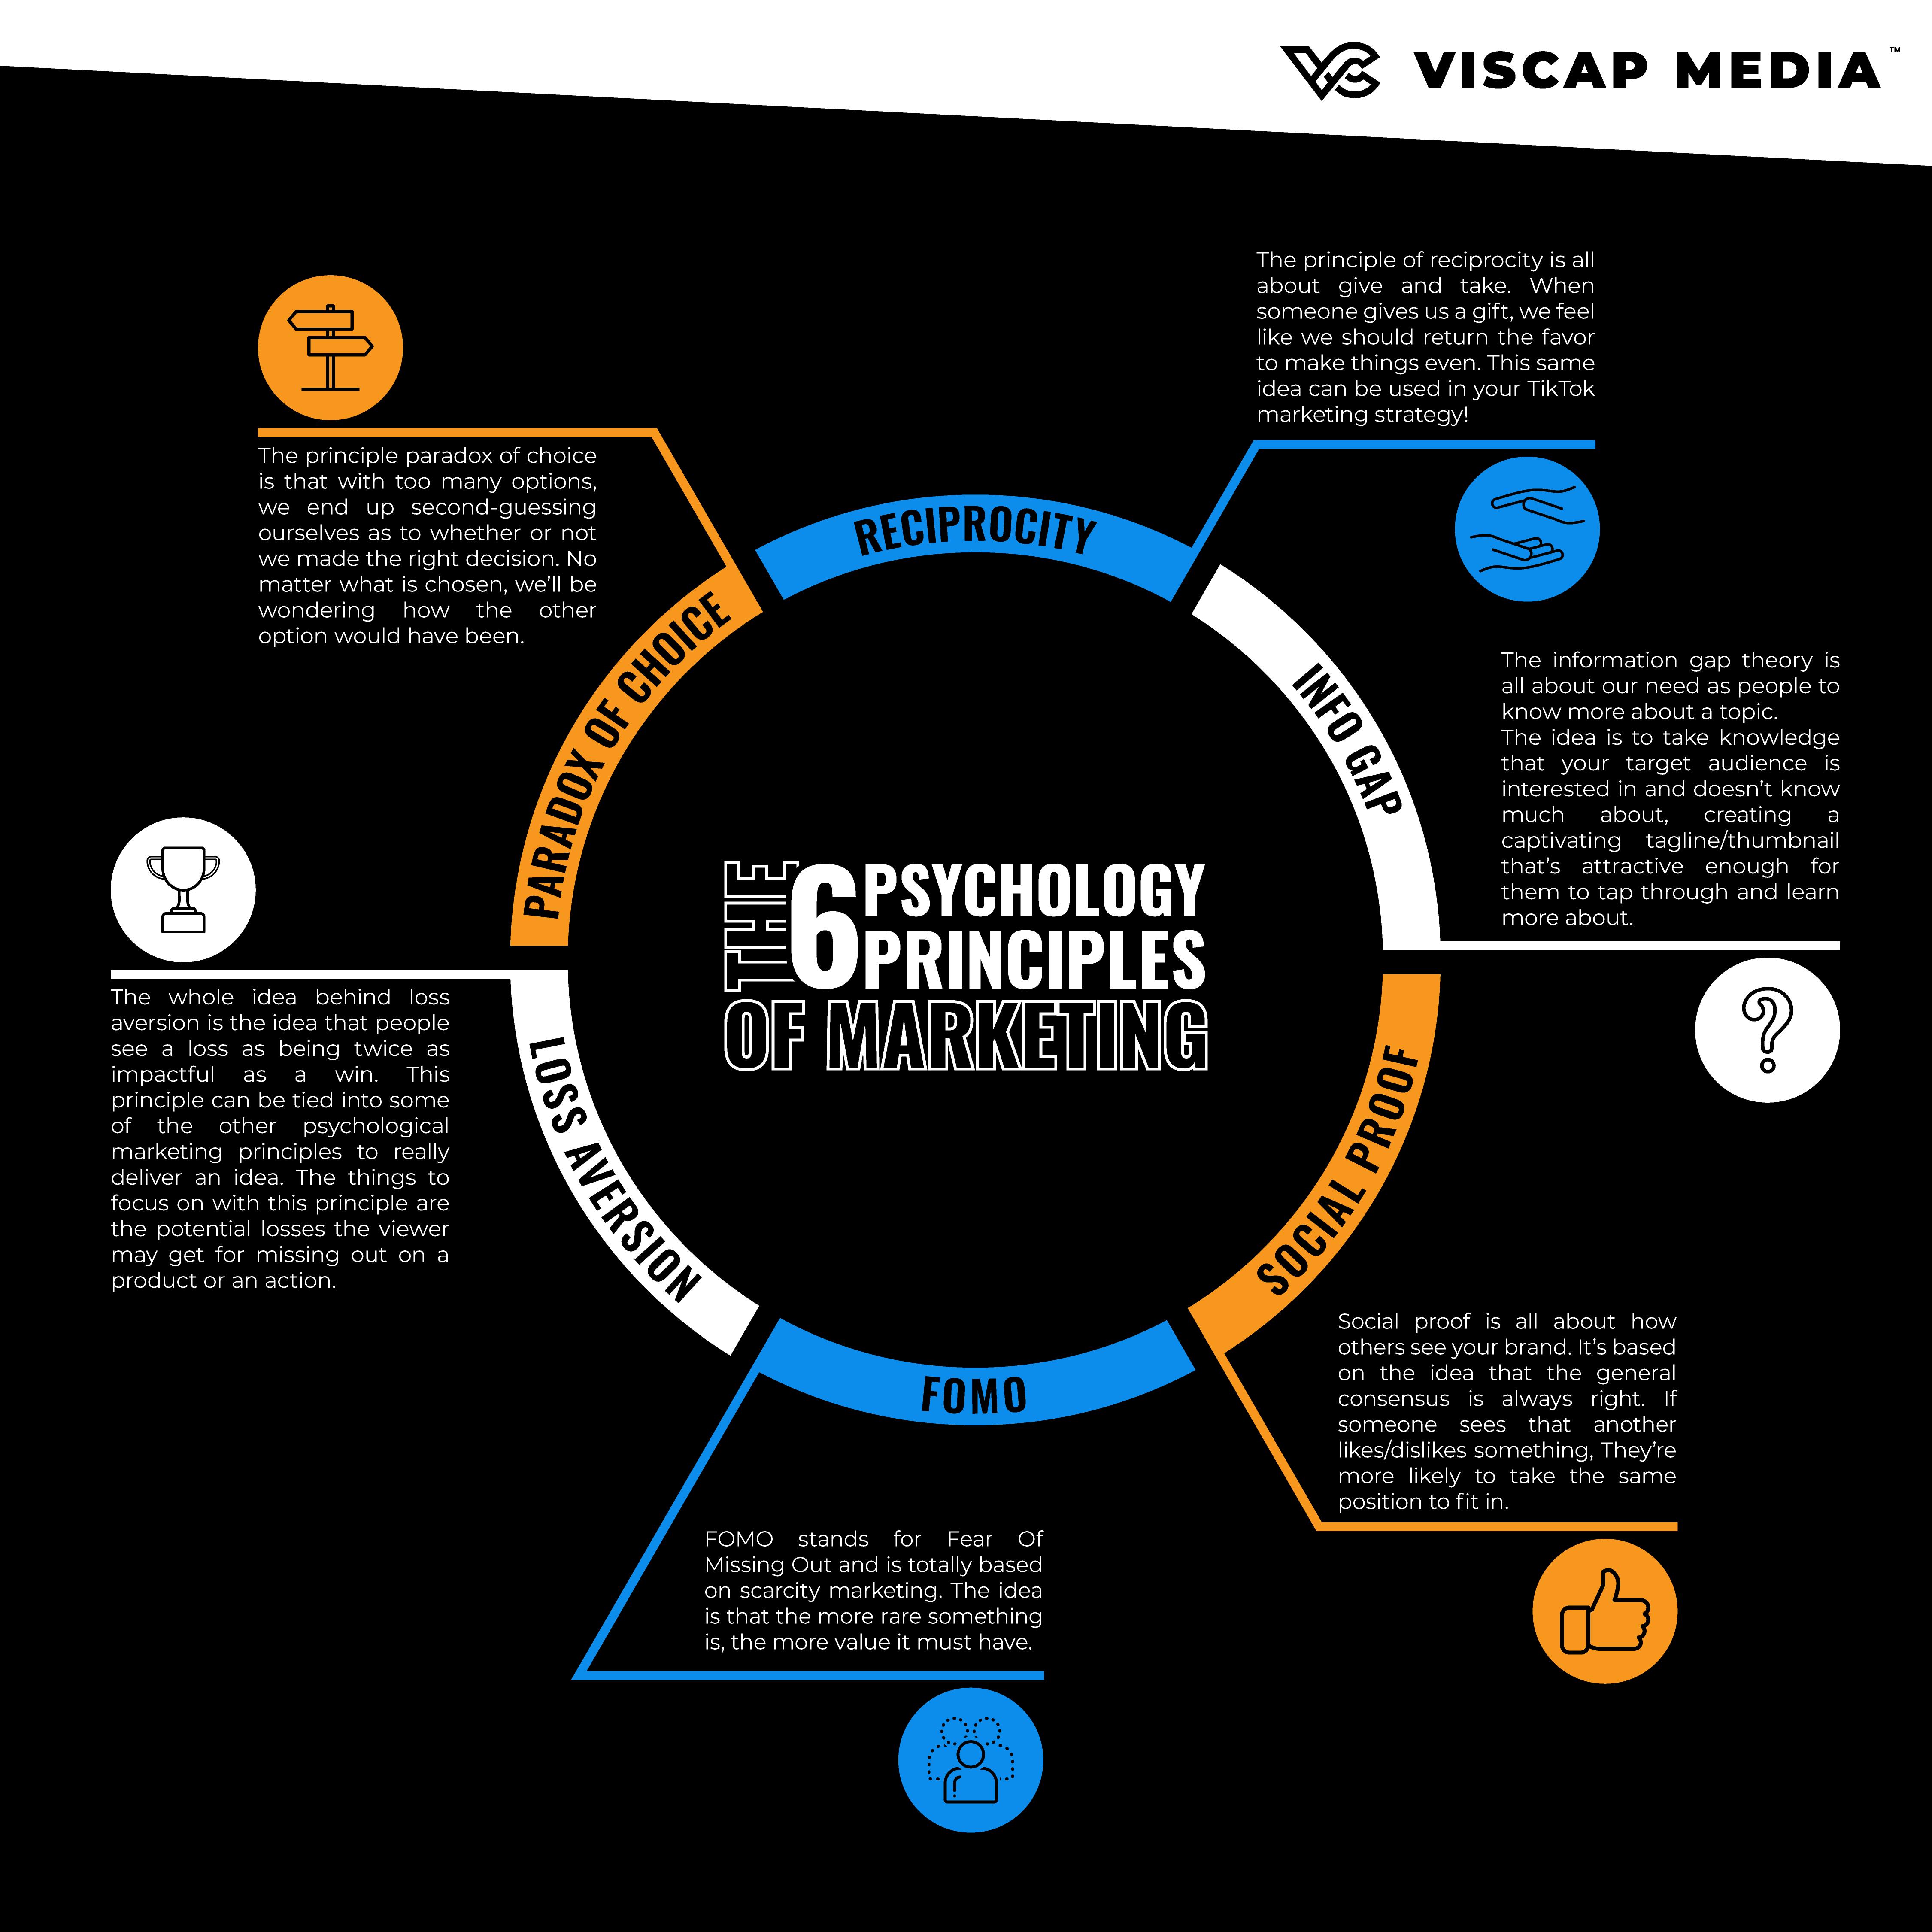 Content Ideas To Advertise On TikTok - 6 Psychology Principles Of Marketing